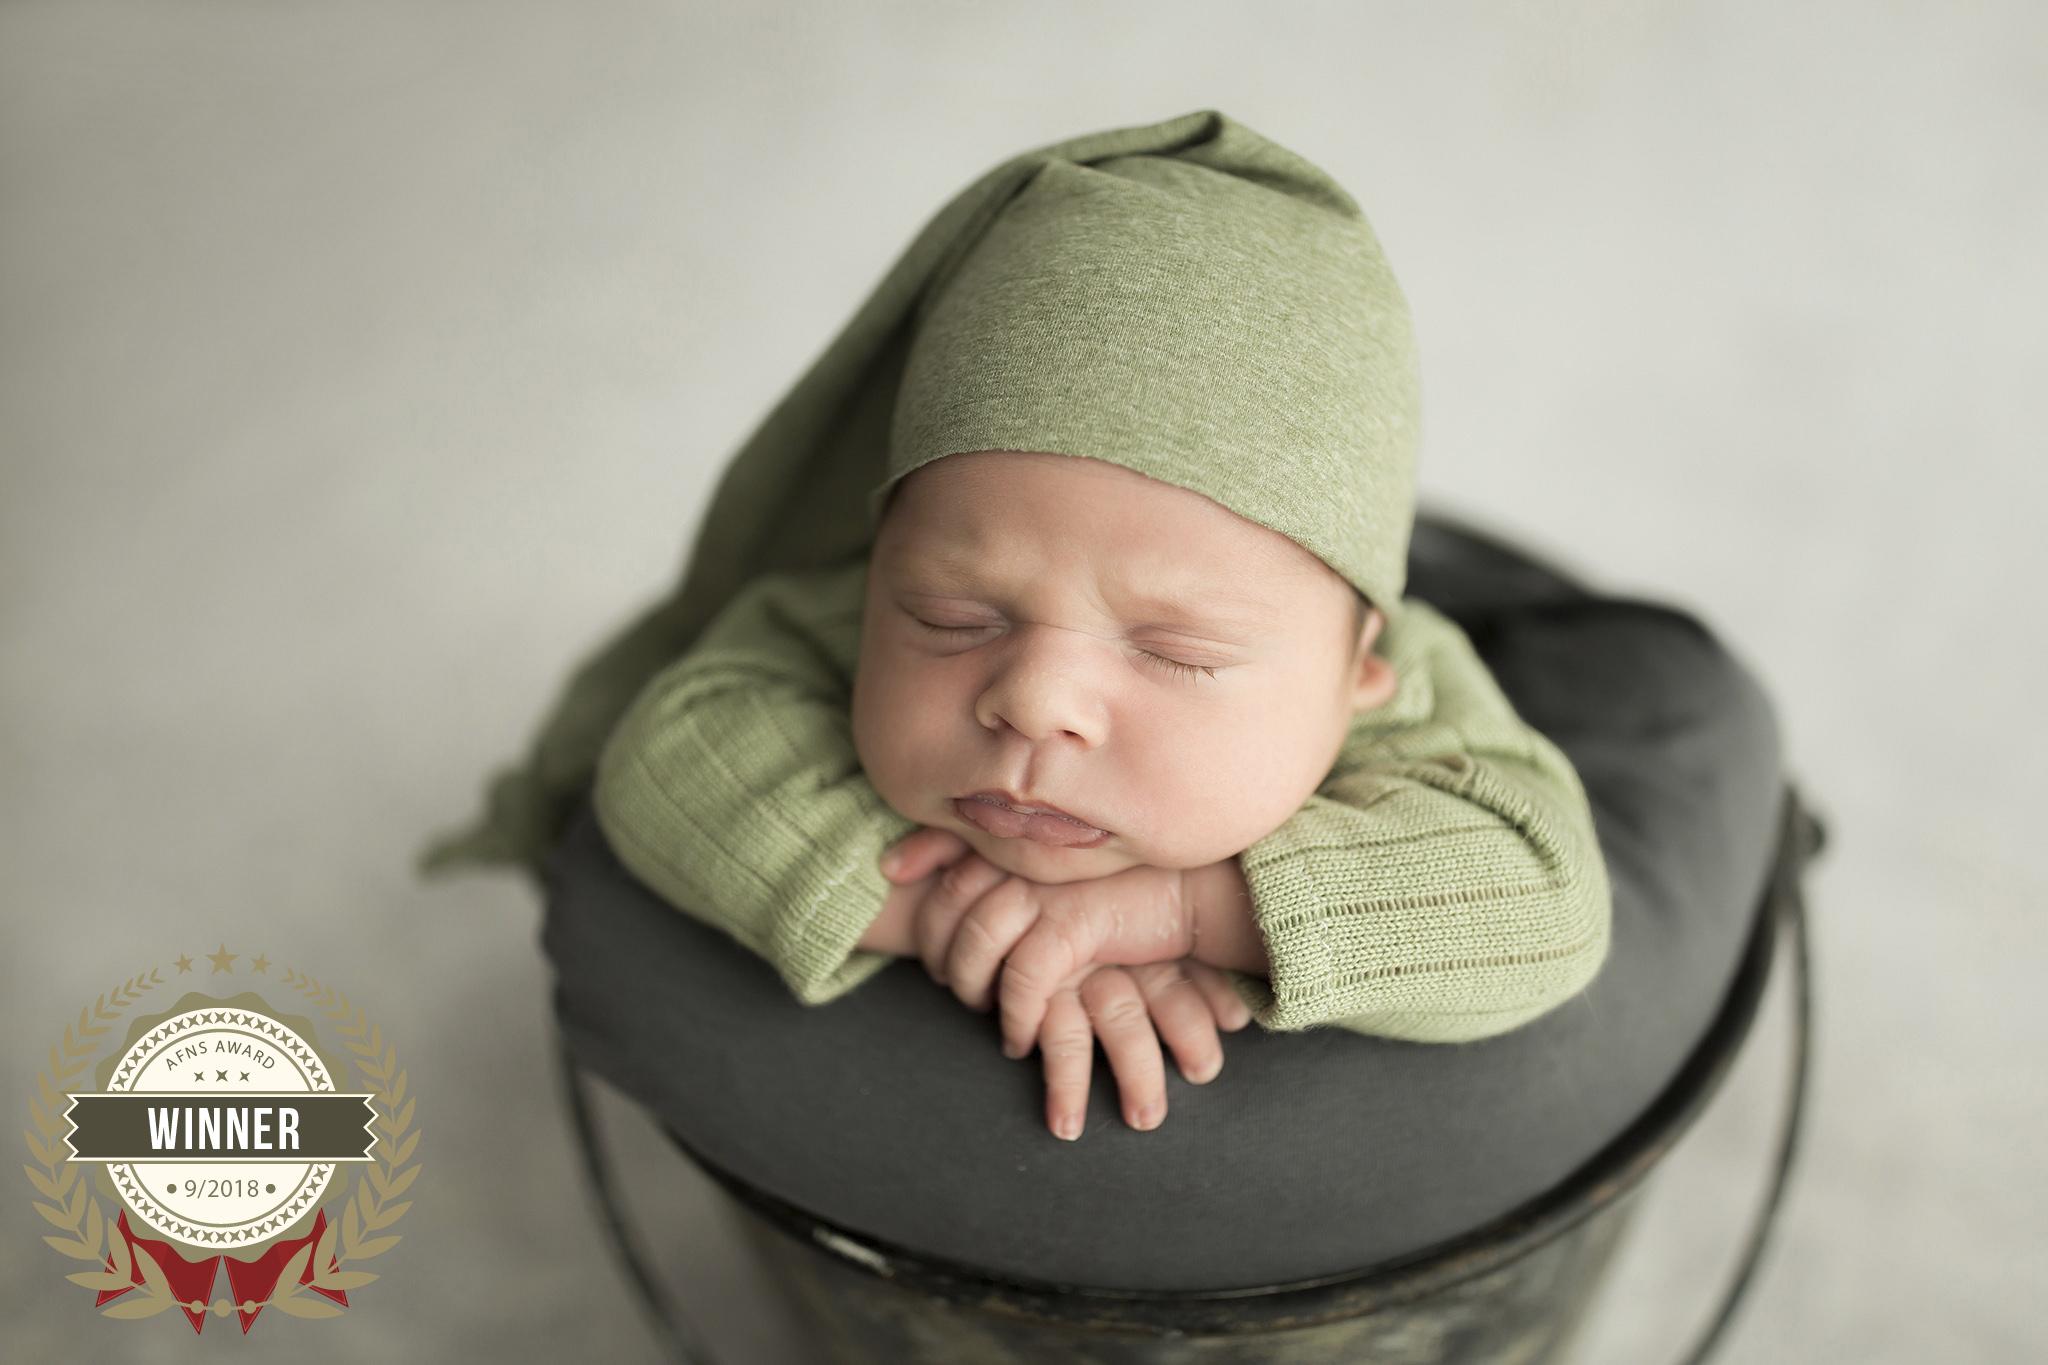 56906443_mini_love_-_linda_olthoff_fotografie_-_newborn.jpg